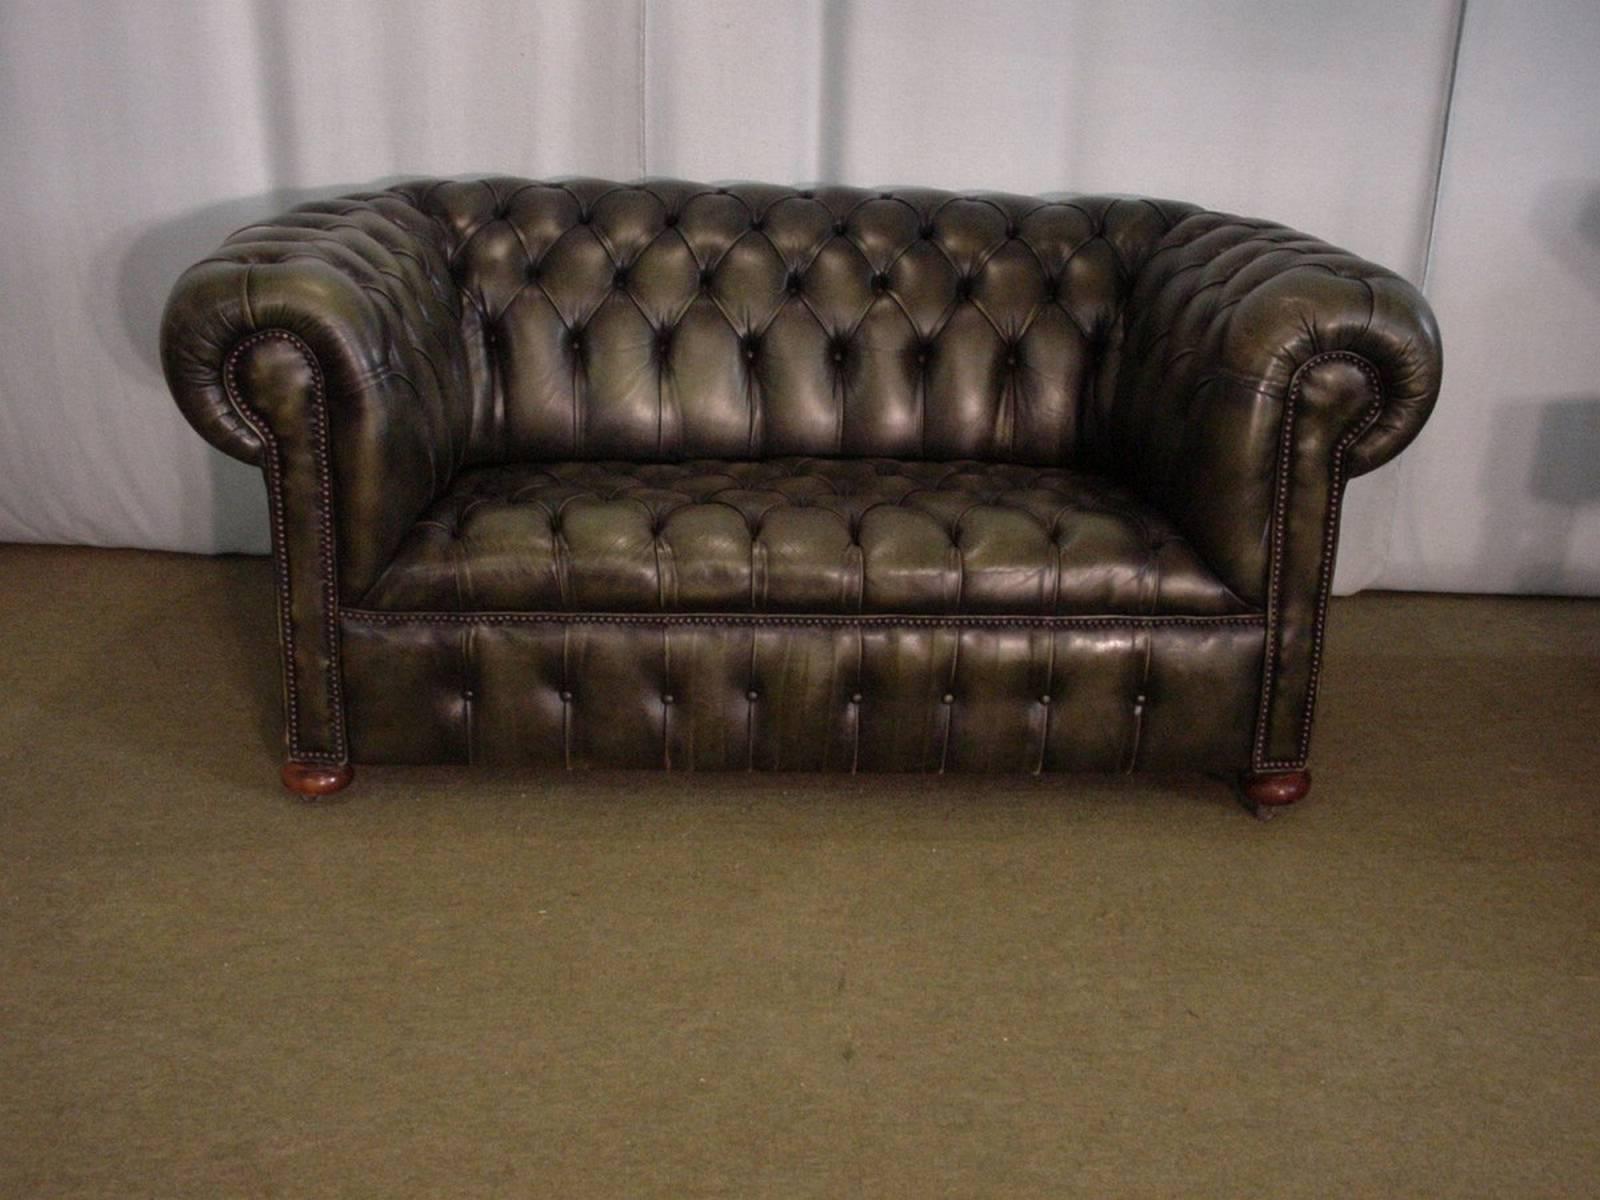 o acheter un canap chesterfield cuir vert deux places. Black Bedroom Furniture Sets. Home Design Ideas